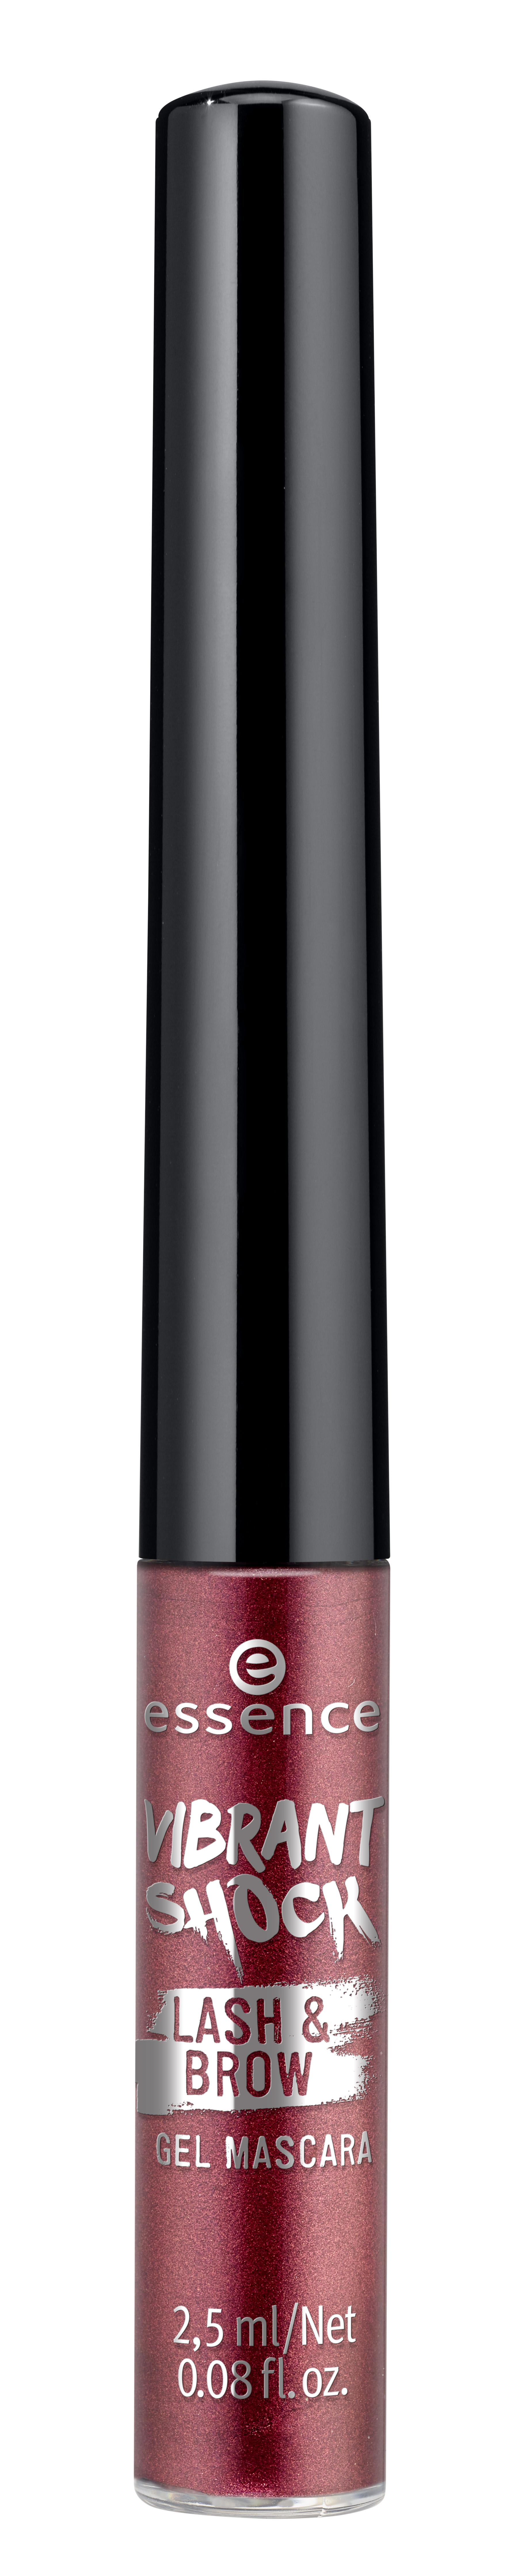 ess. vibrant shock lash & brow gel mascara 01